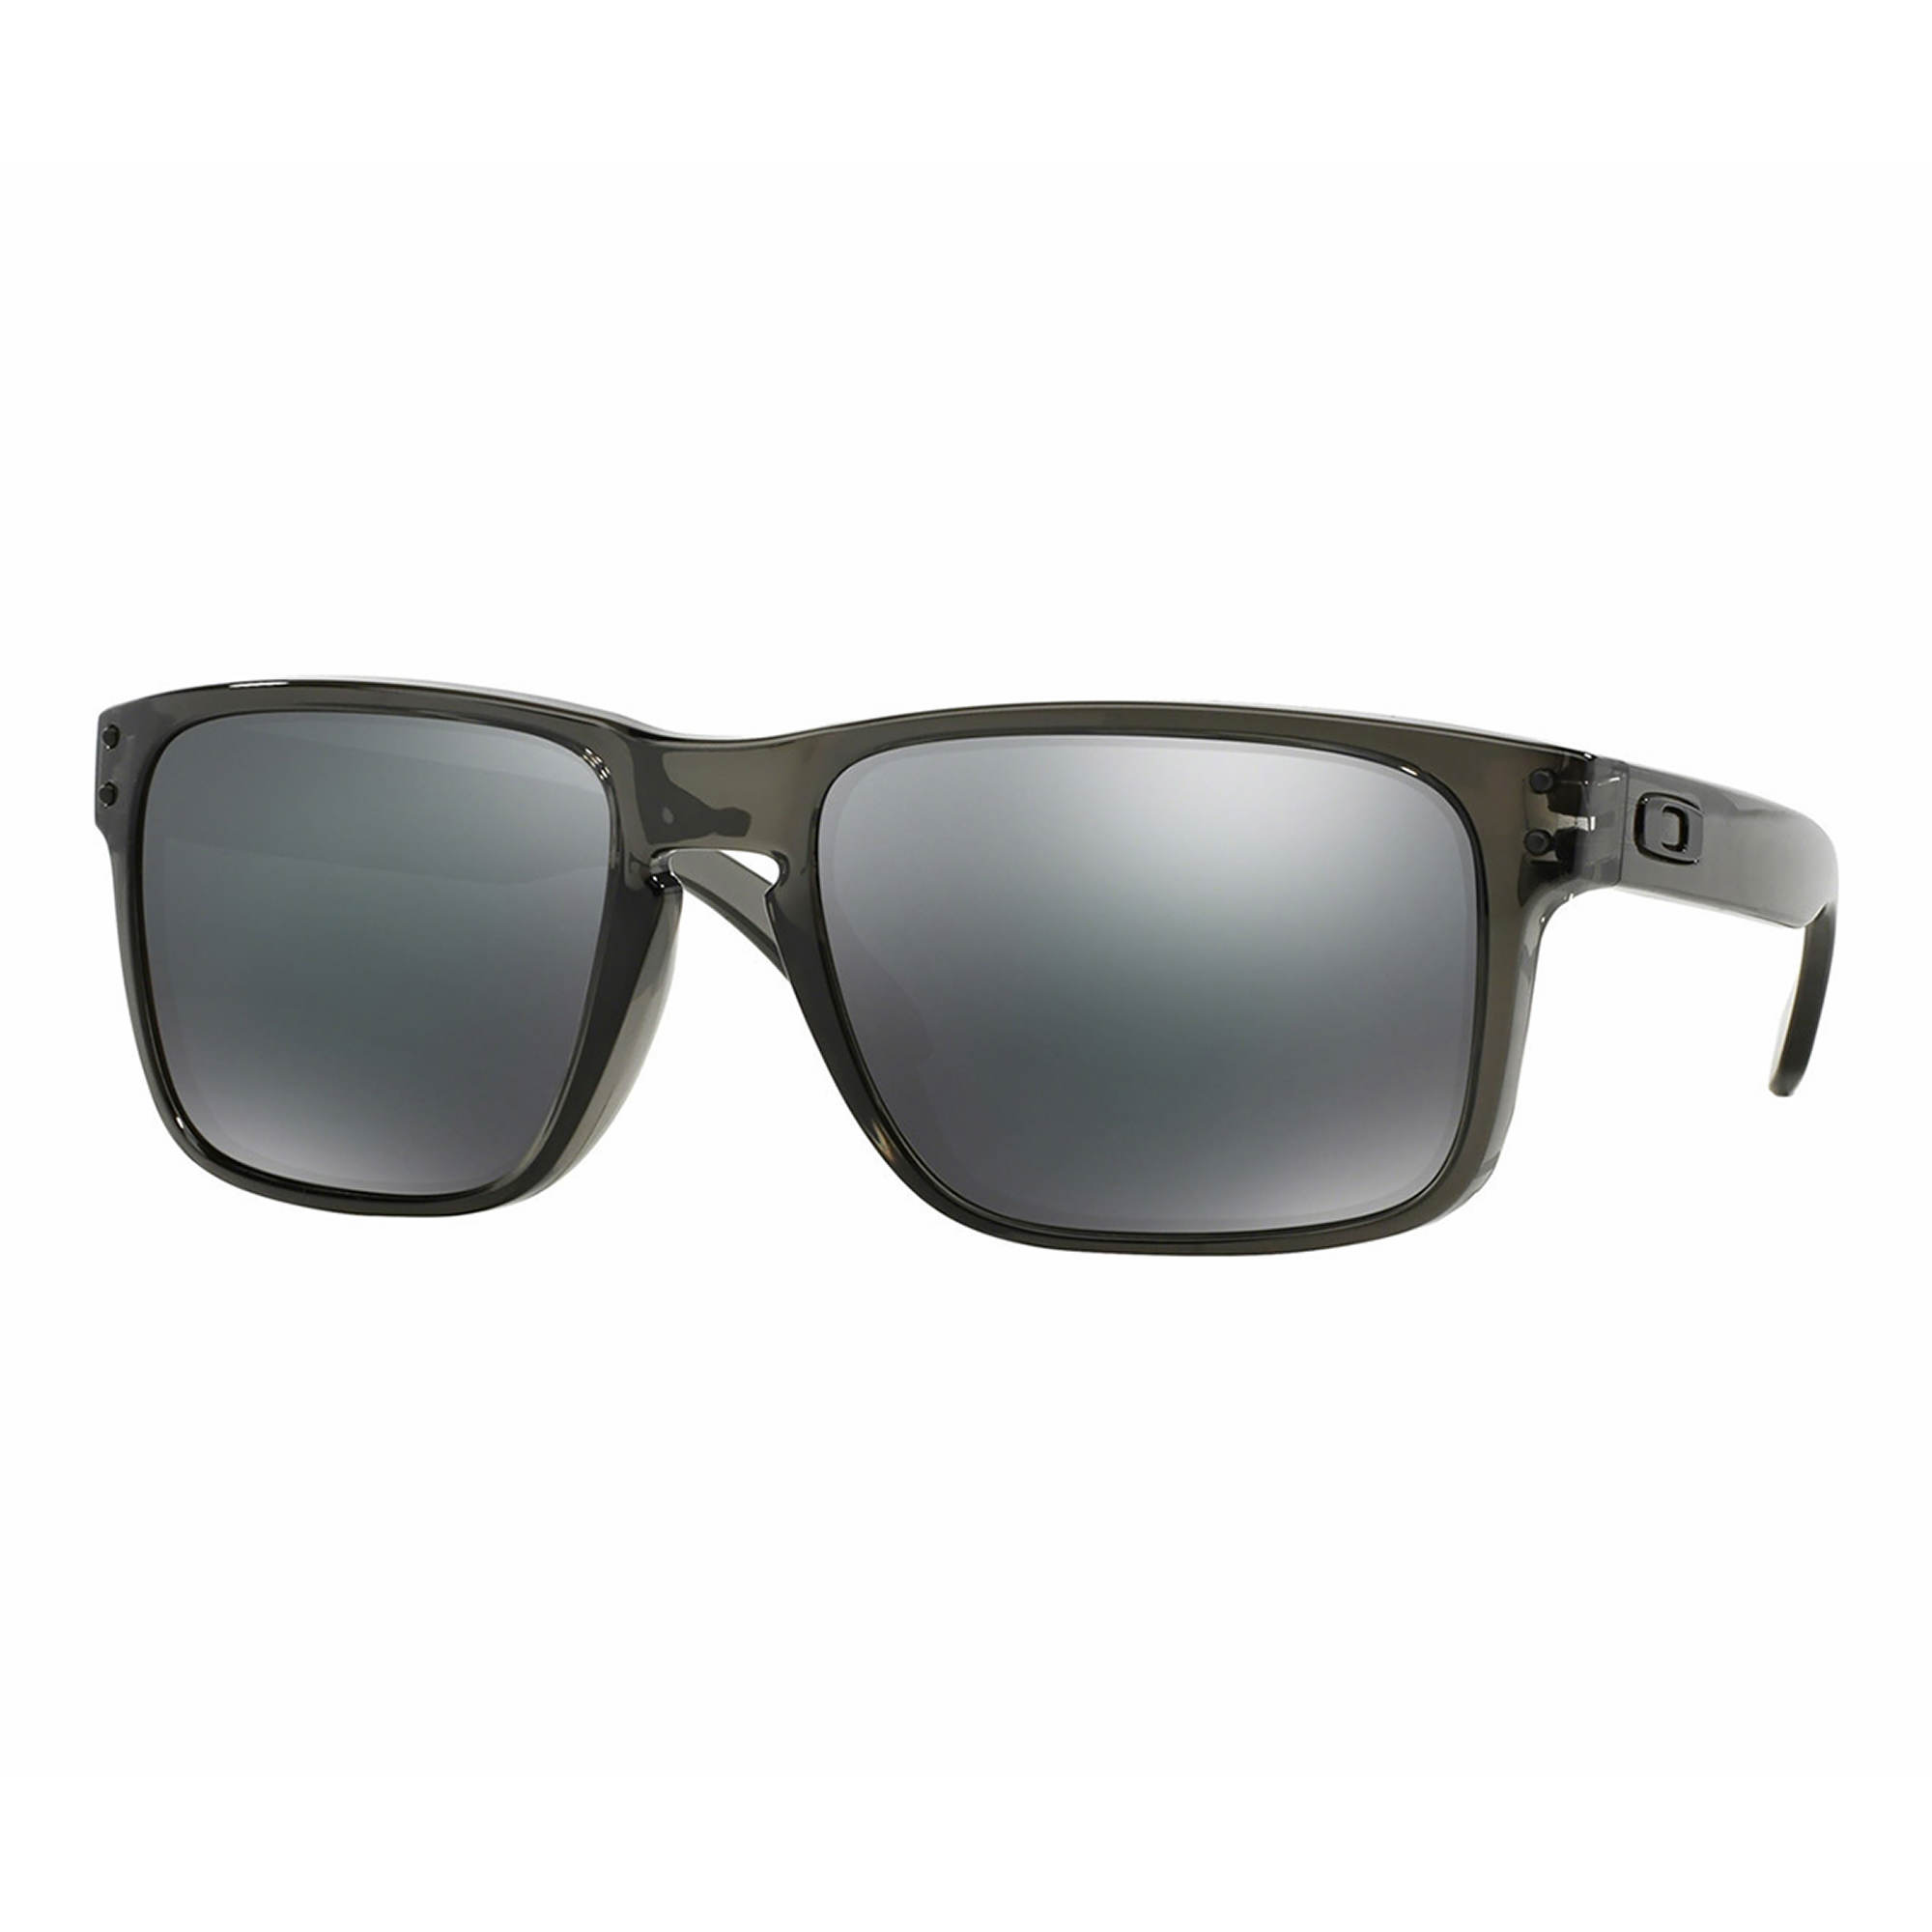 e8ee9d56dc3 Oakley Holbrook Men s Sunglasses - Gray Smoke Frame Black Iridium ...